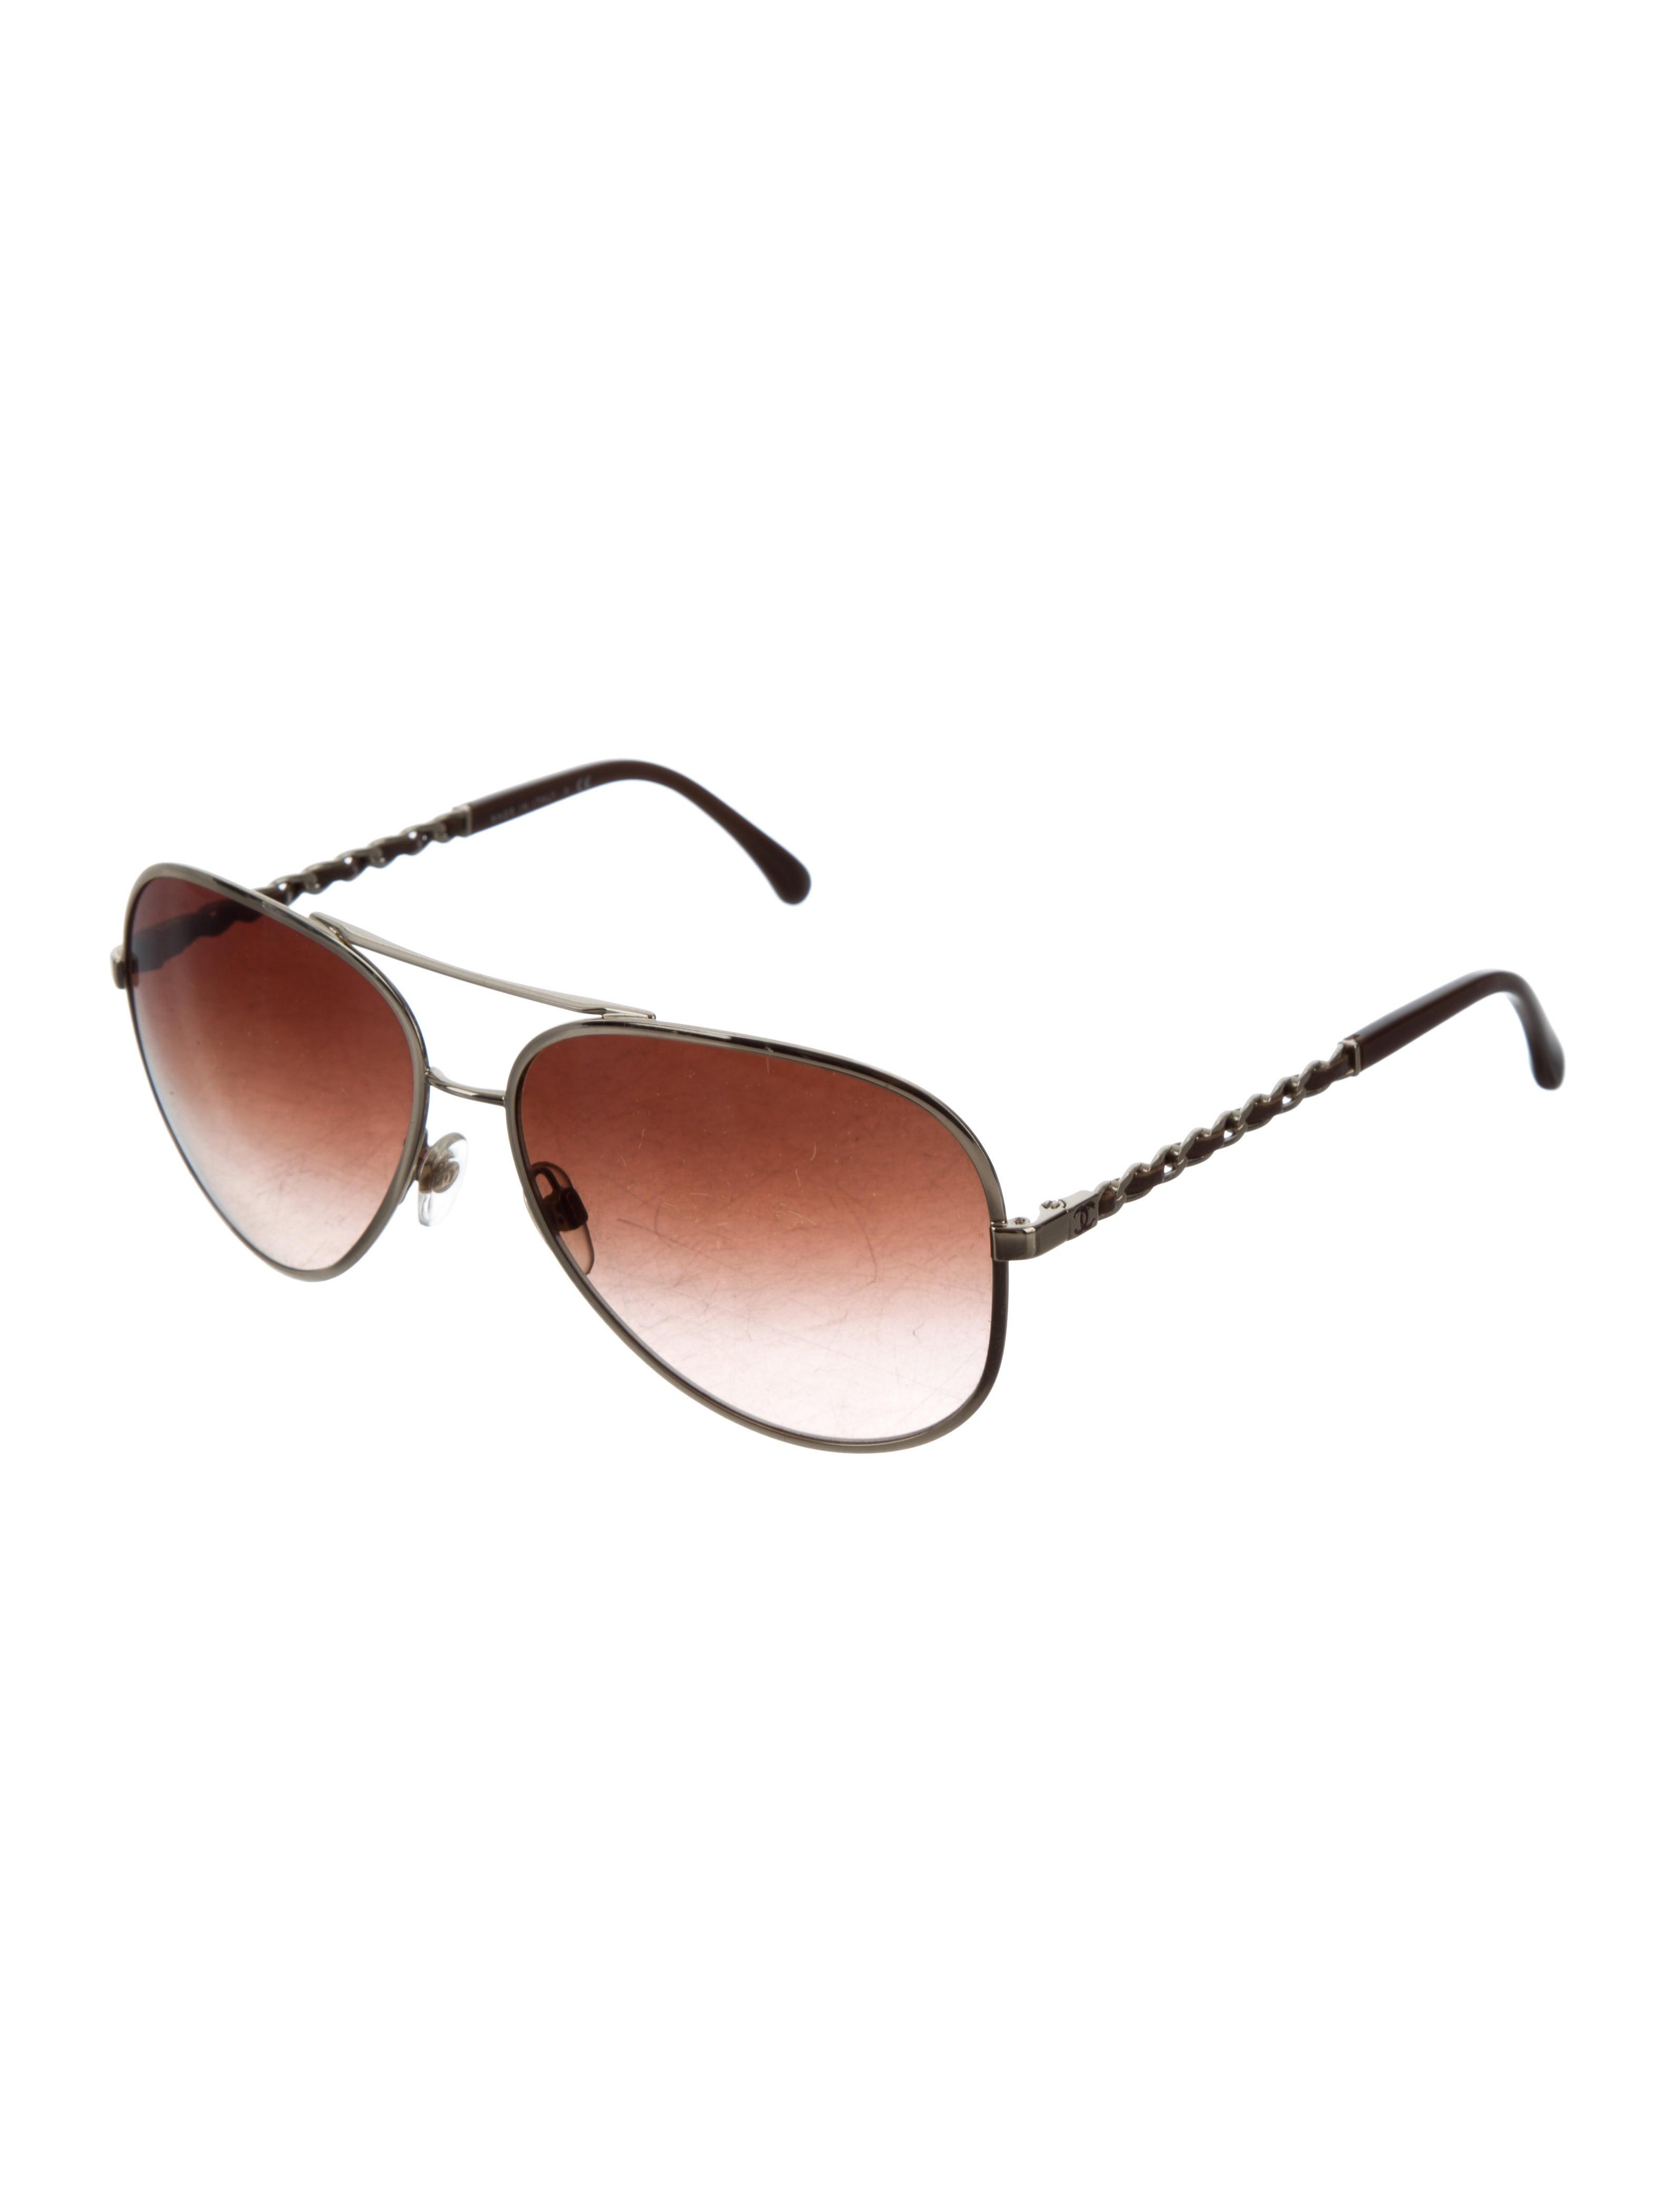 9733205c2d Chanel Aviator Sunglasses